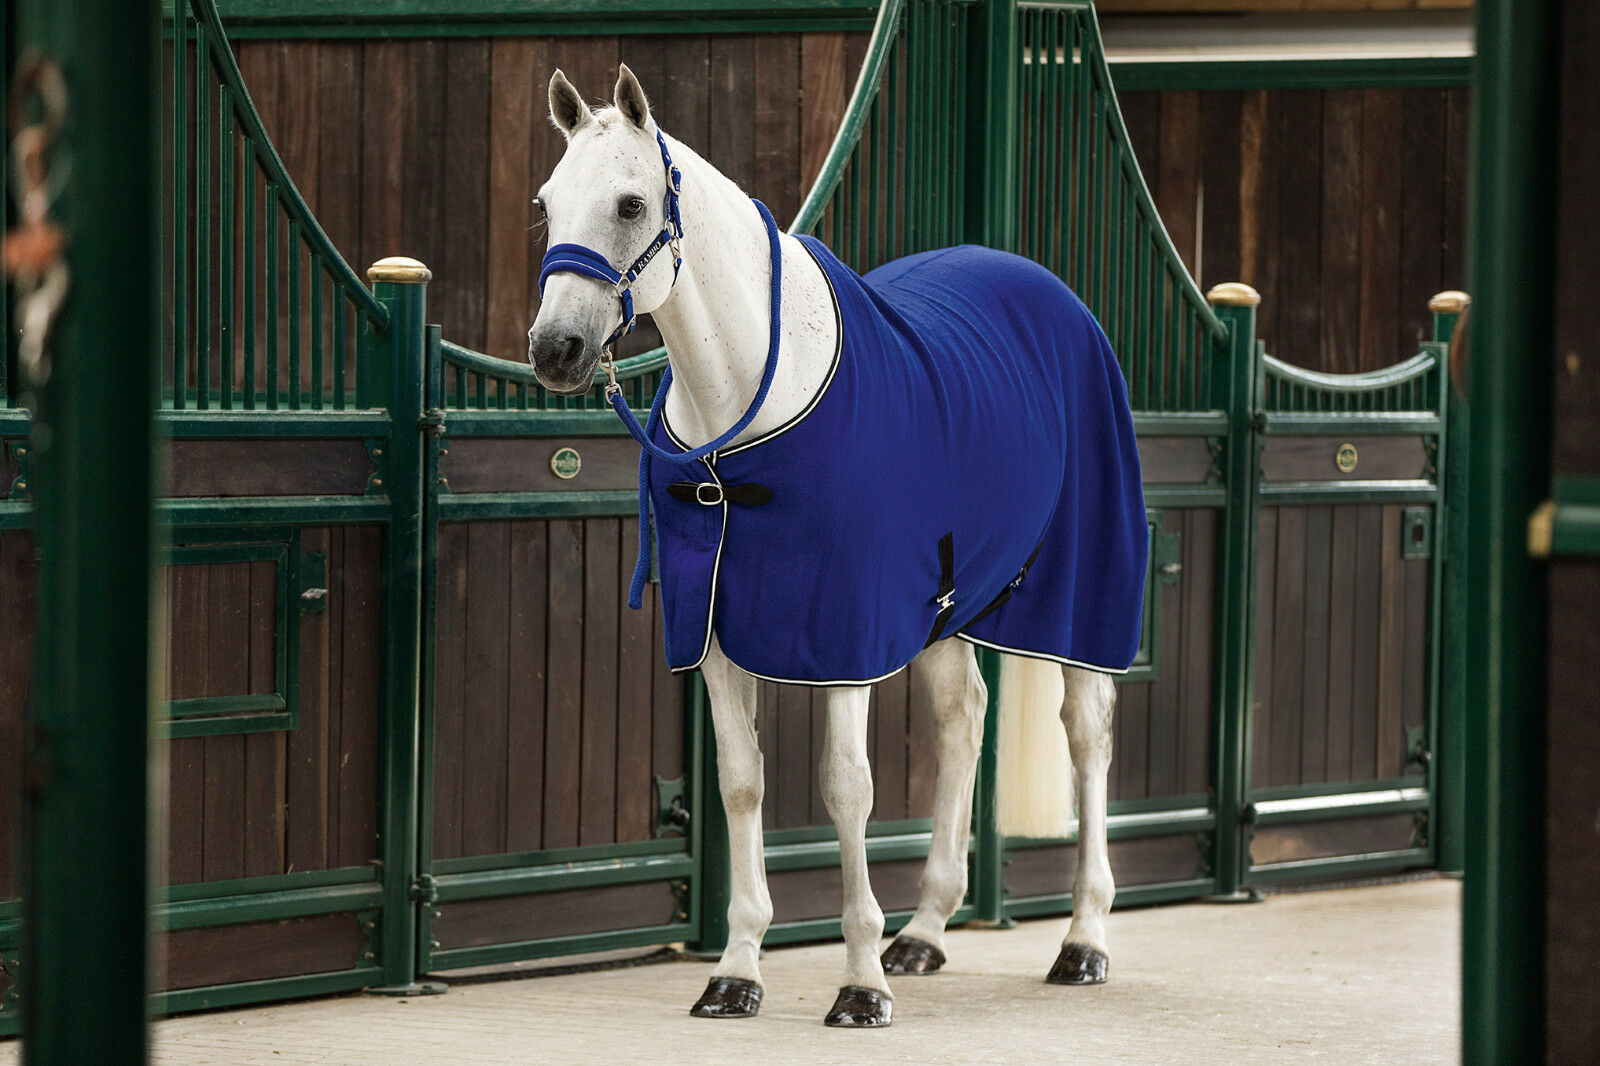 Horseware Rambo Lana Alfombra Enfriador estable viajes Capa Hoja Azul Real 5' 0  -7' 3